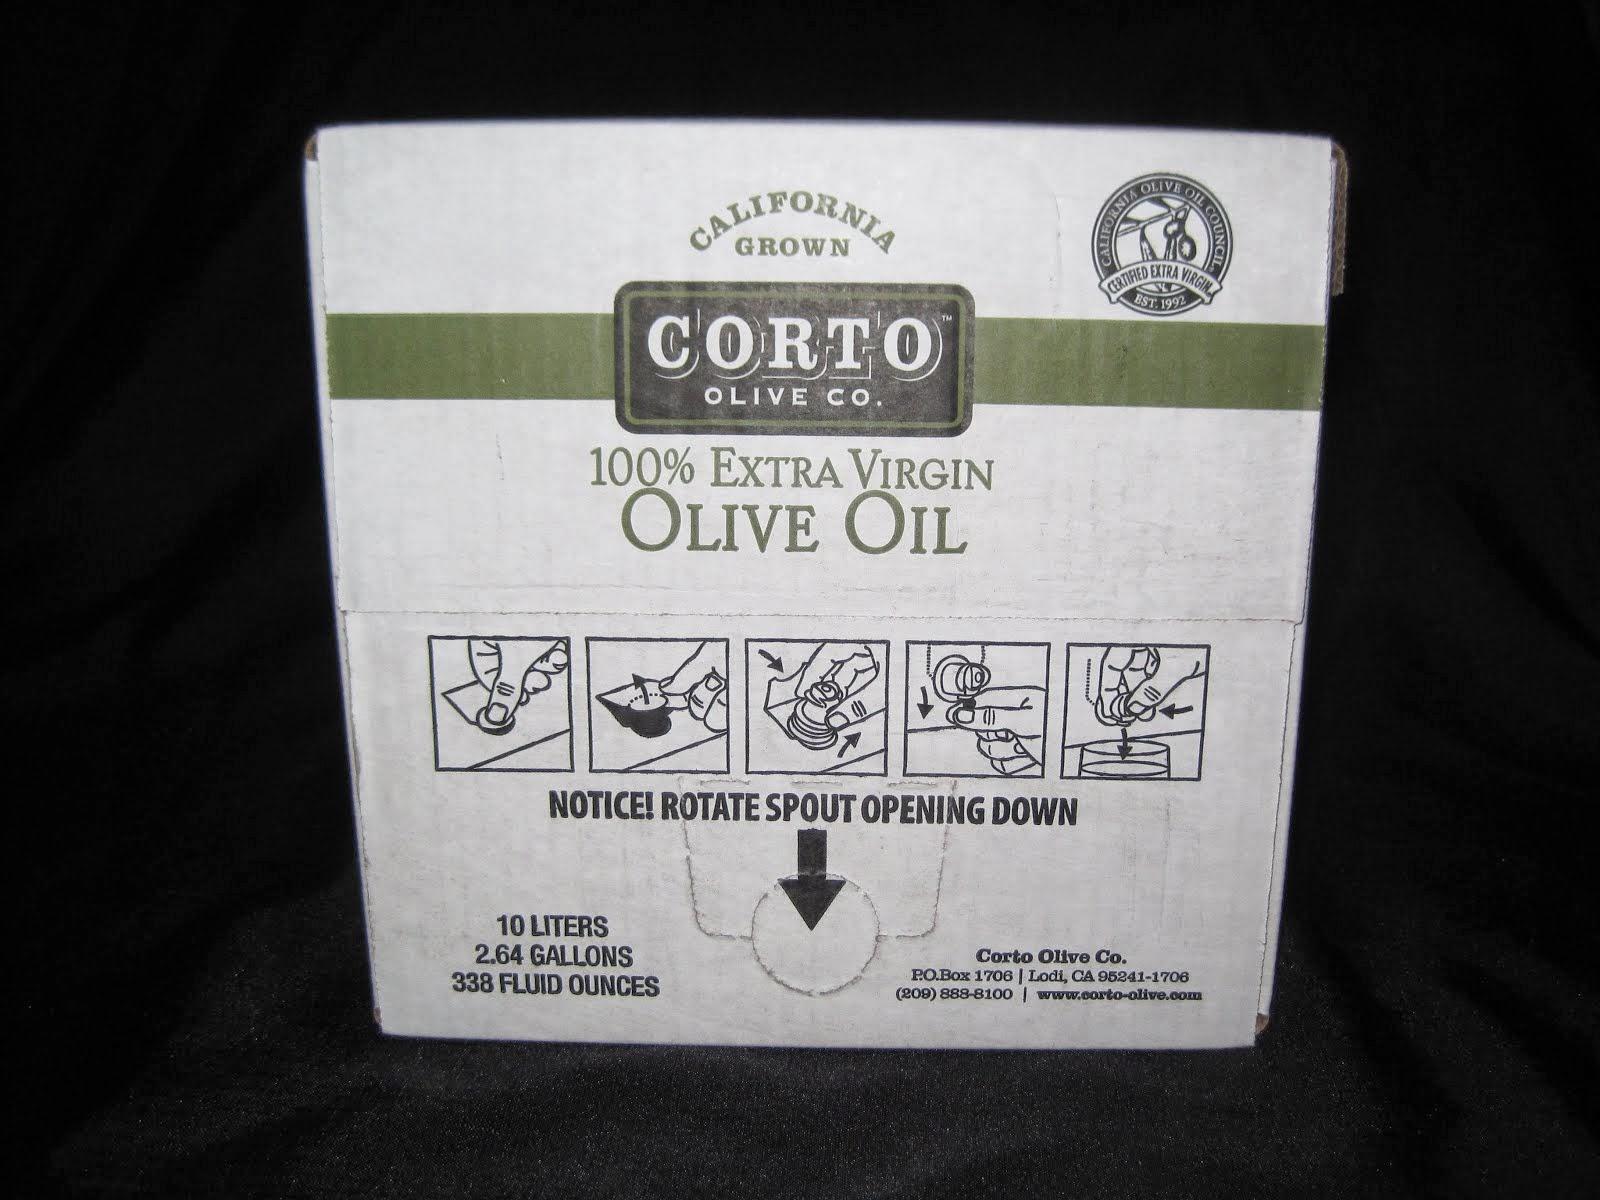 Extra Virgin Olive Oil - Bag in box - Stays Fresh till the last drop - Item # 73660